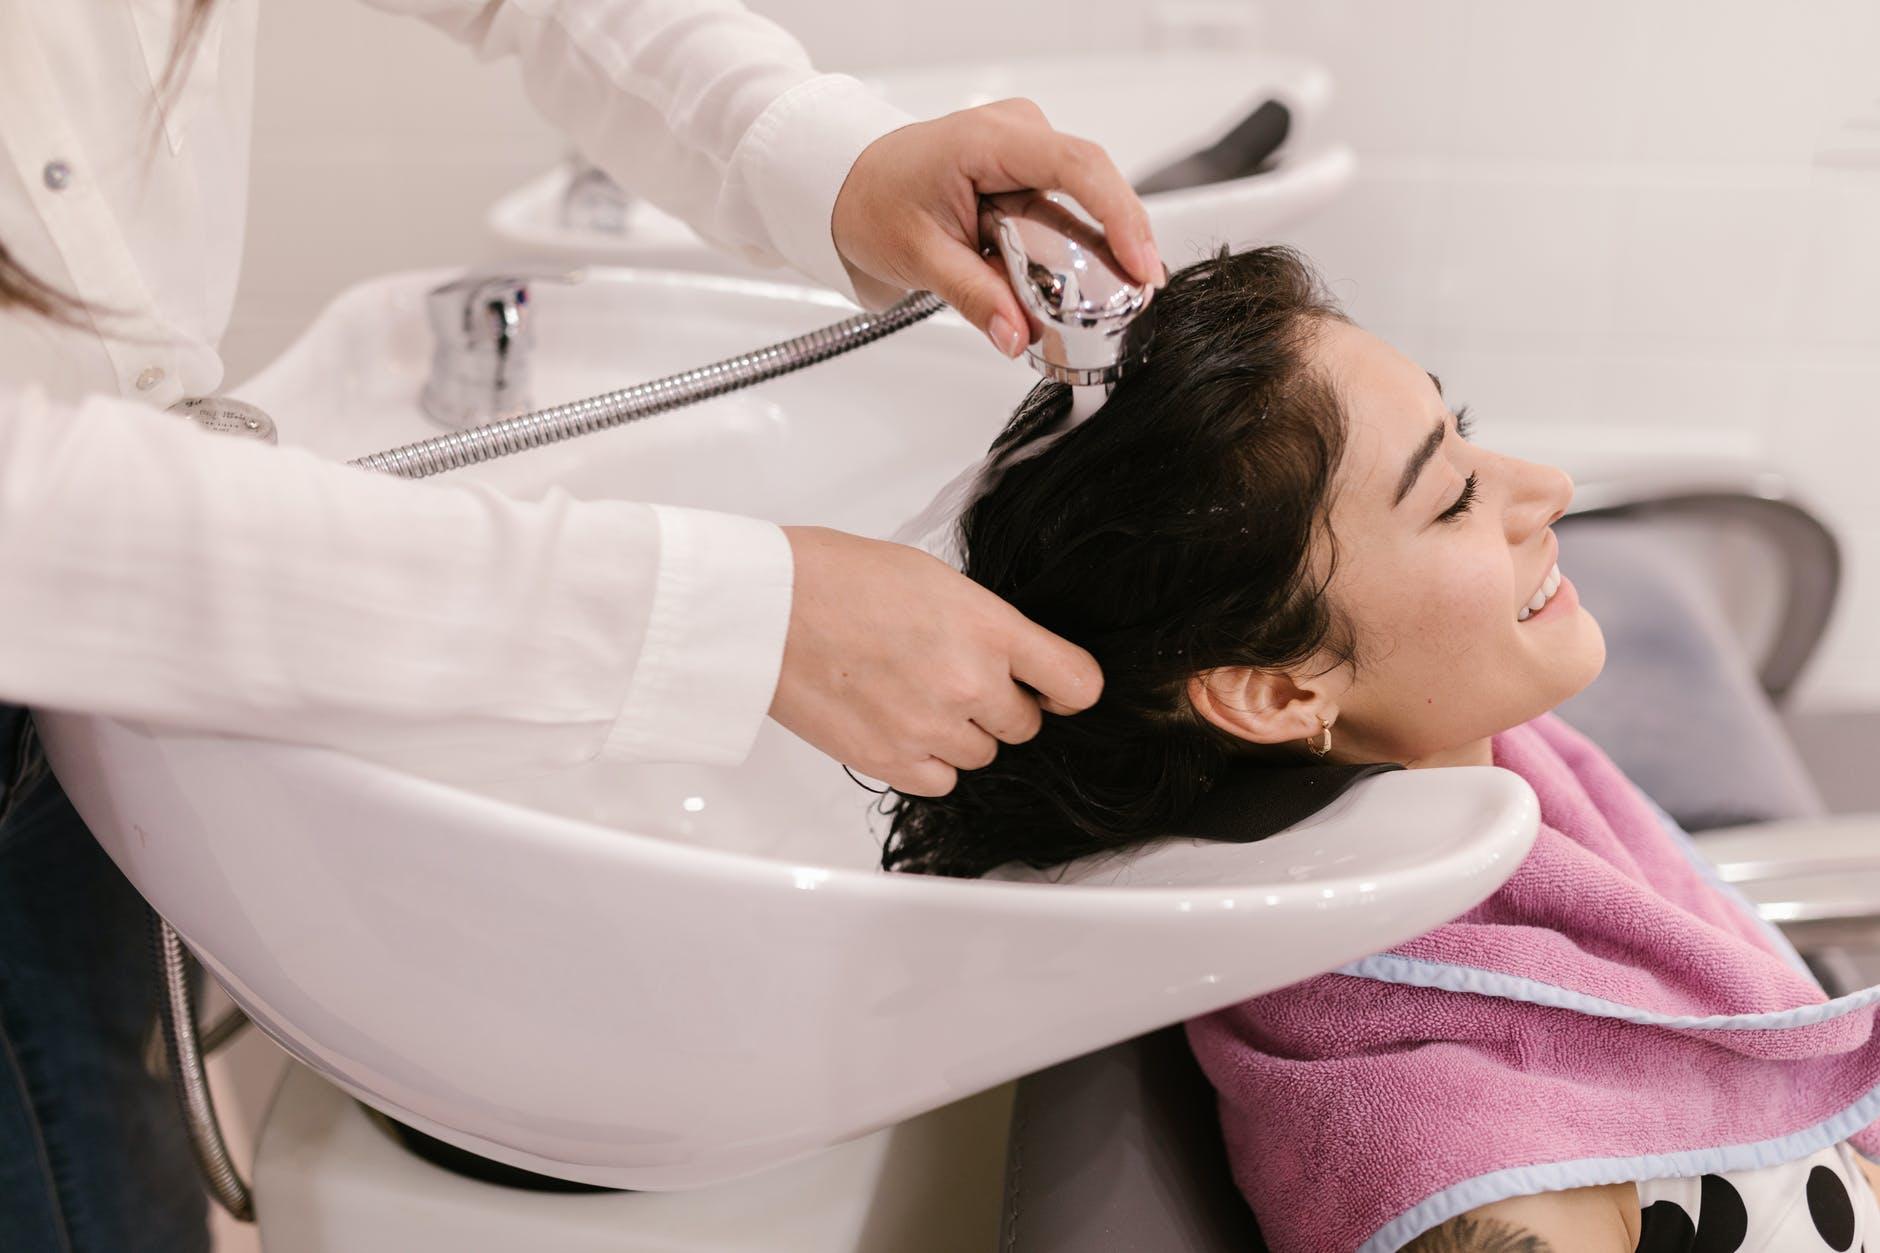 Indulge in a Guilt-free Luxurious Hair Treatment Salon